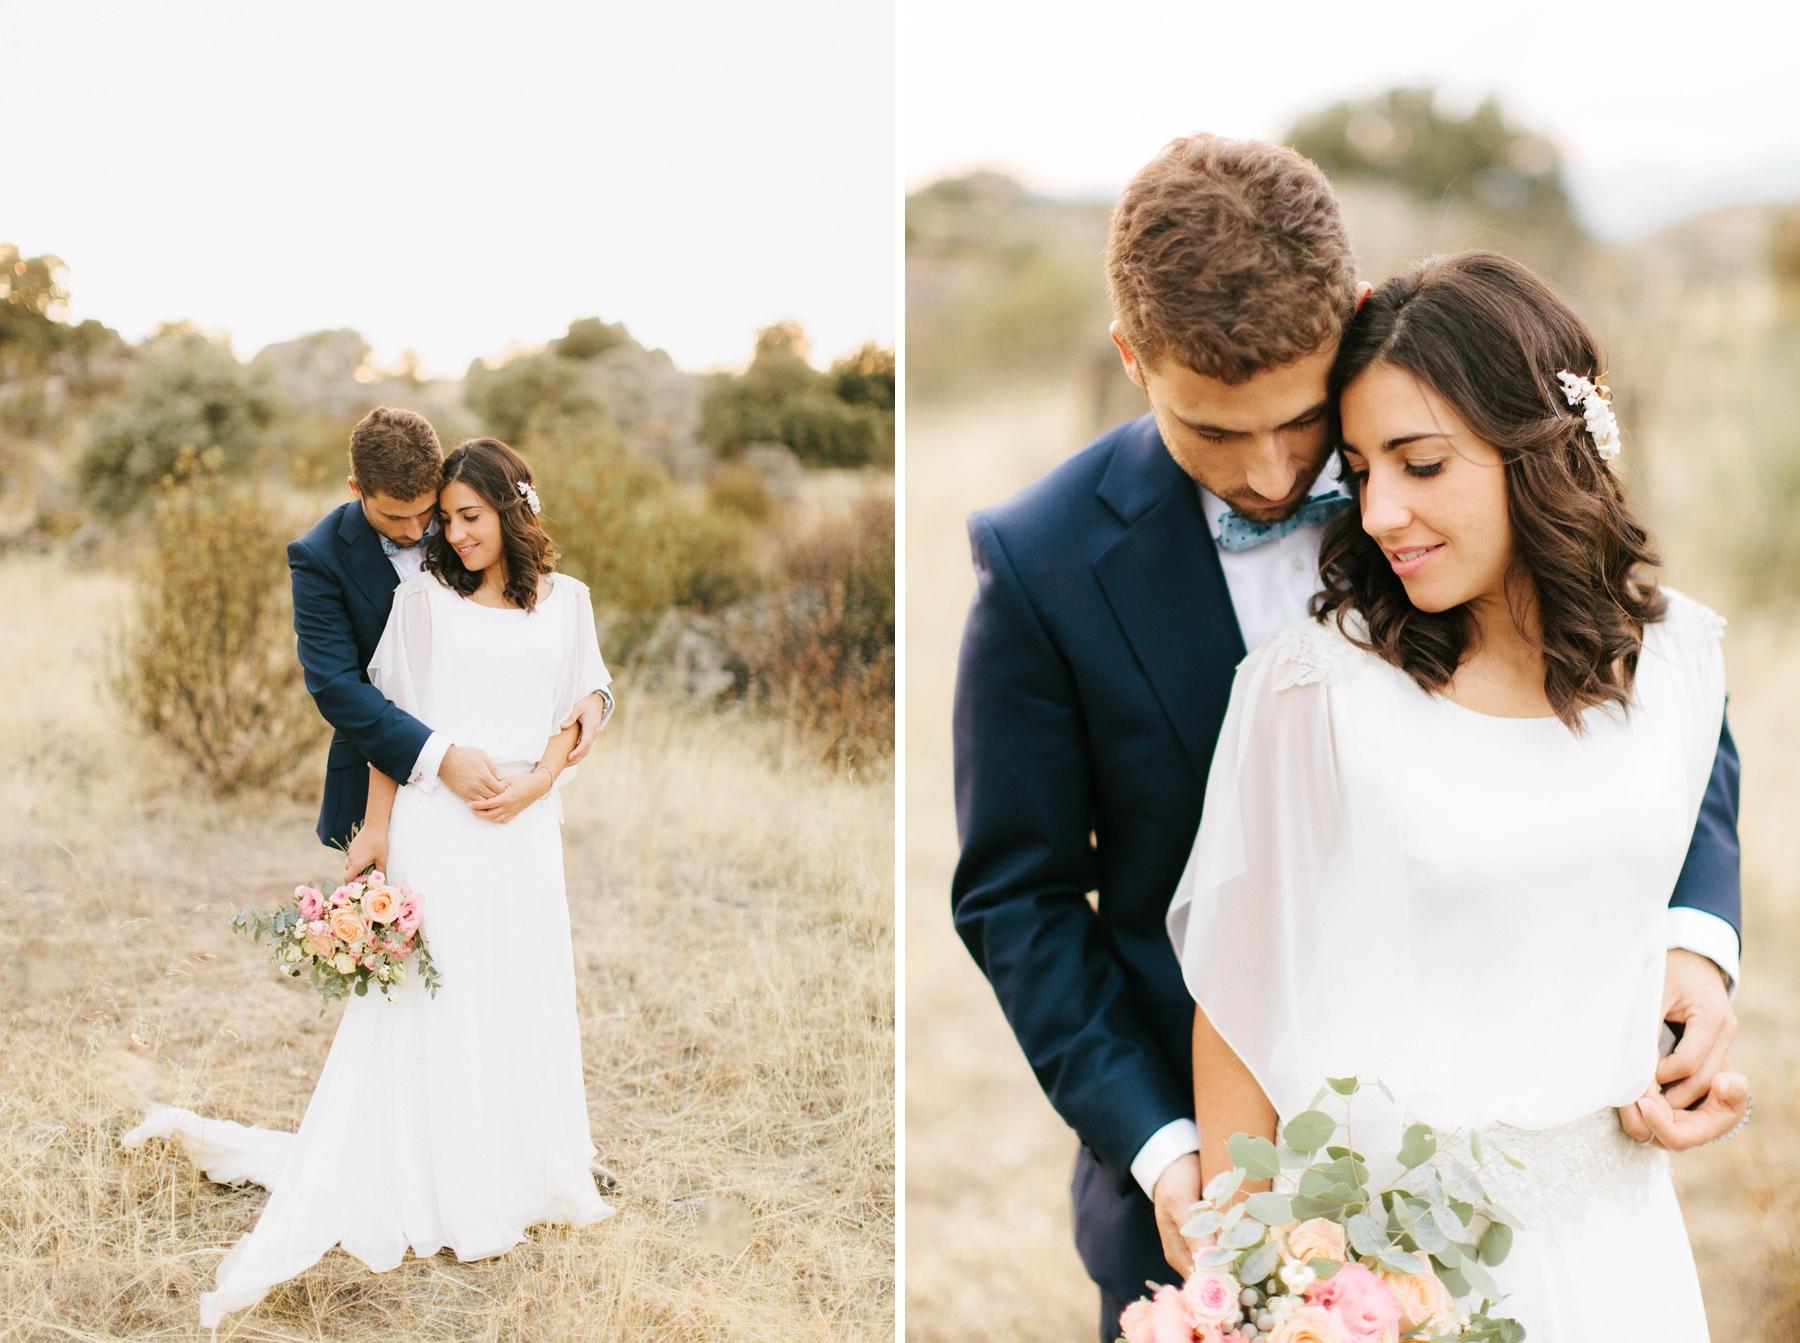 fotografo de bodas Jairo Crena-164